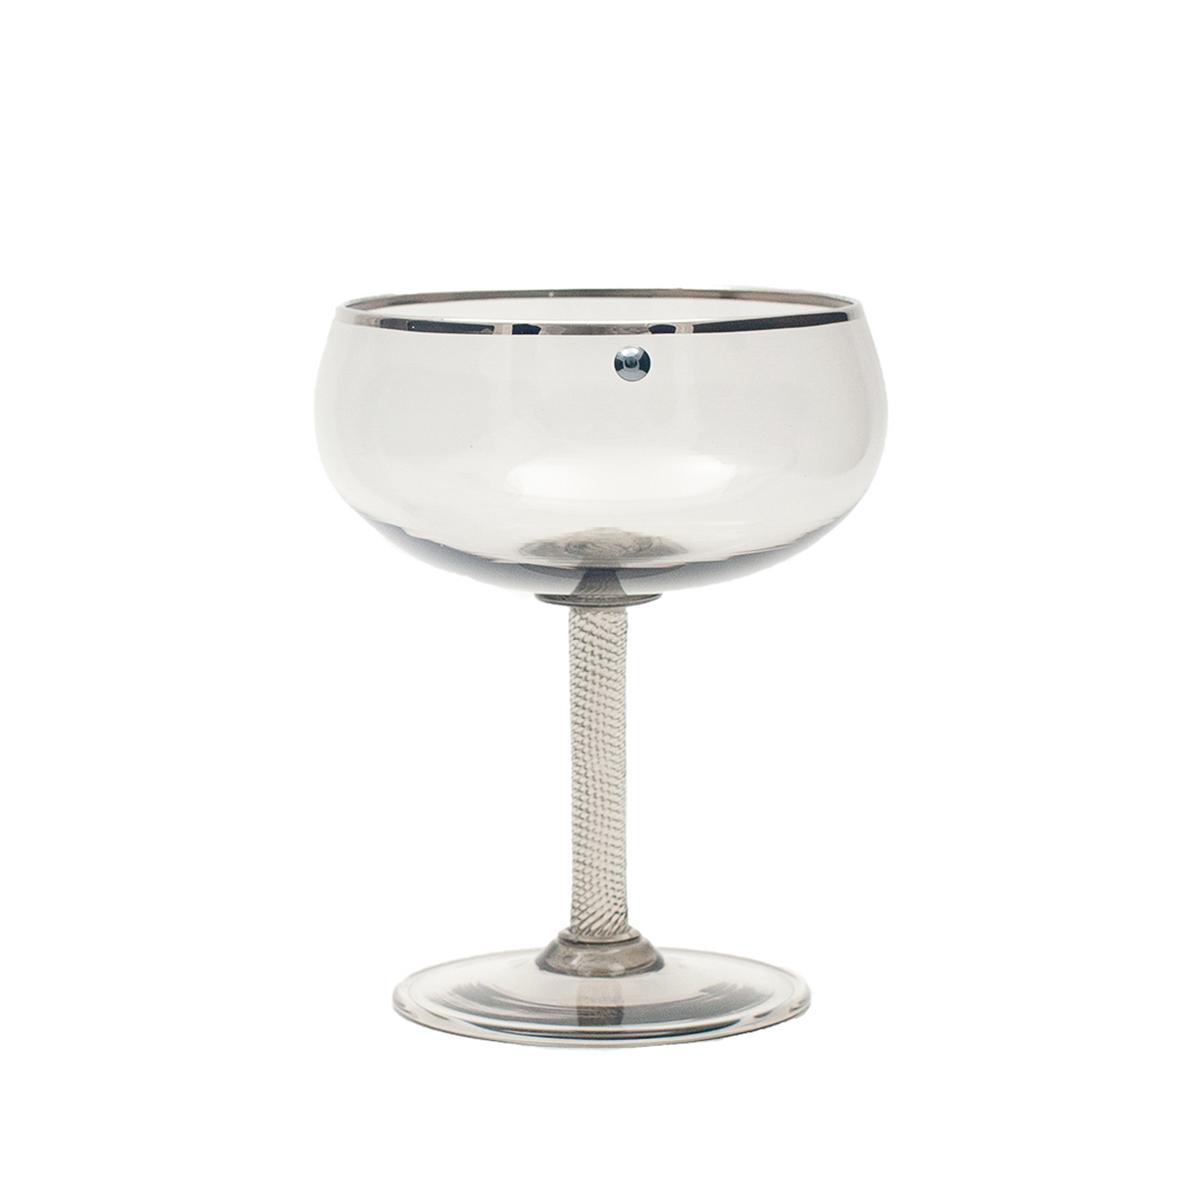 San-valentino-champagne-coupe-sparkling-wine-handmade-murano-venice-platinum-designer-cristal